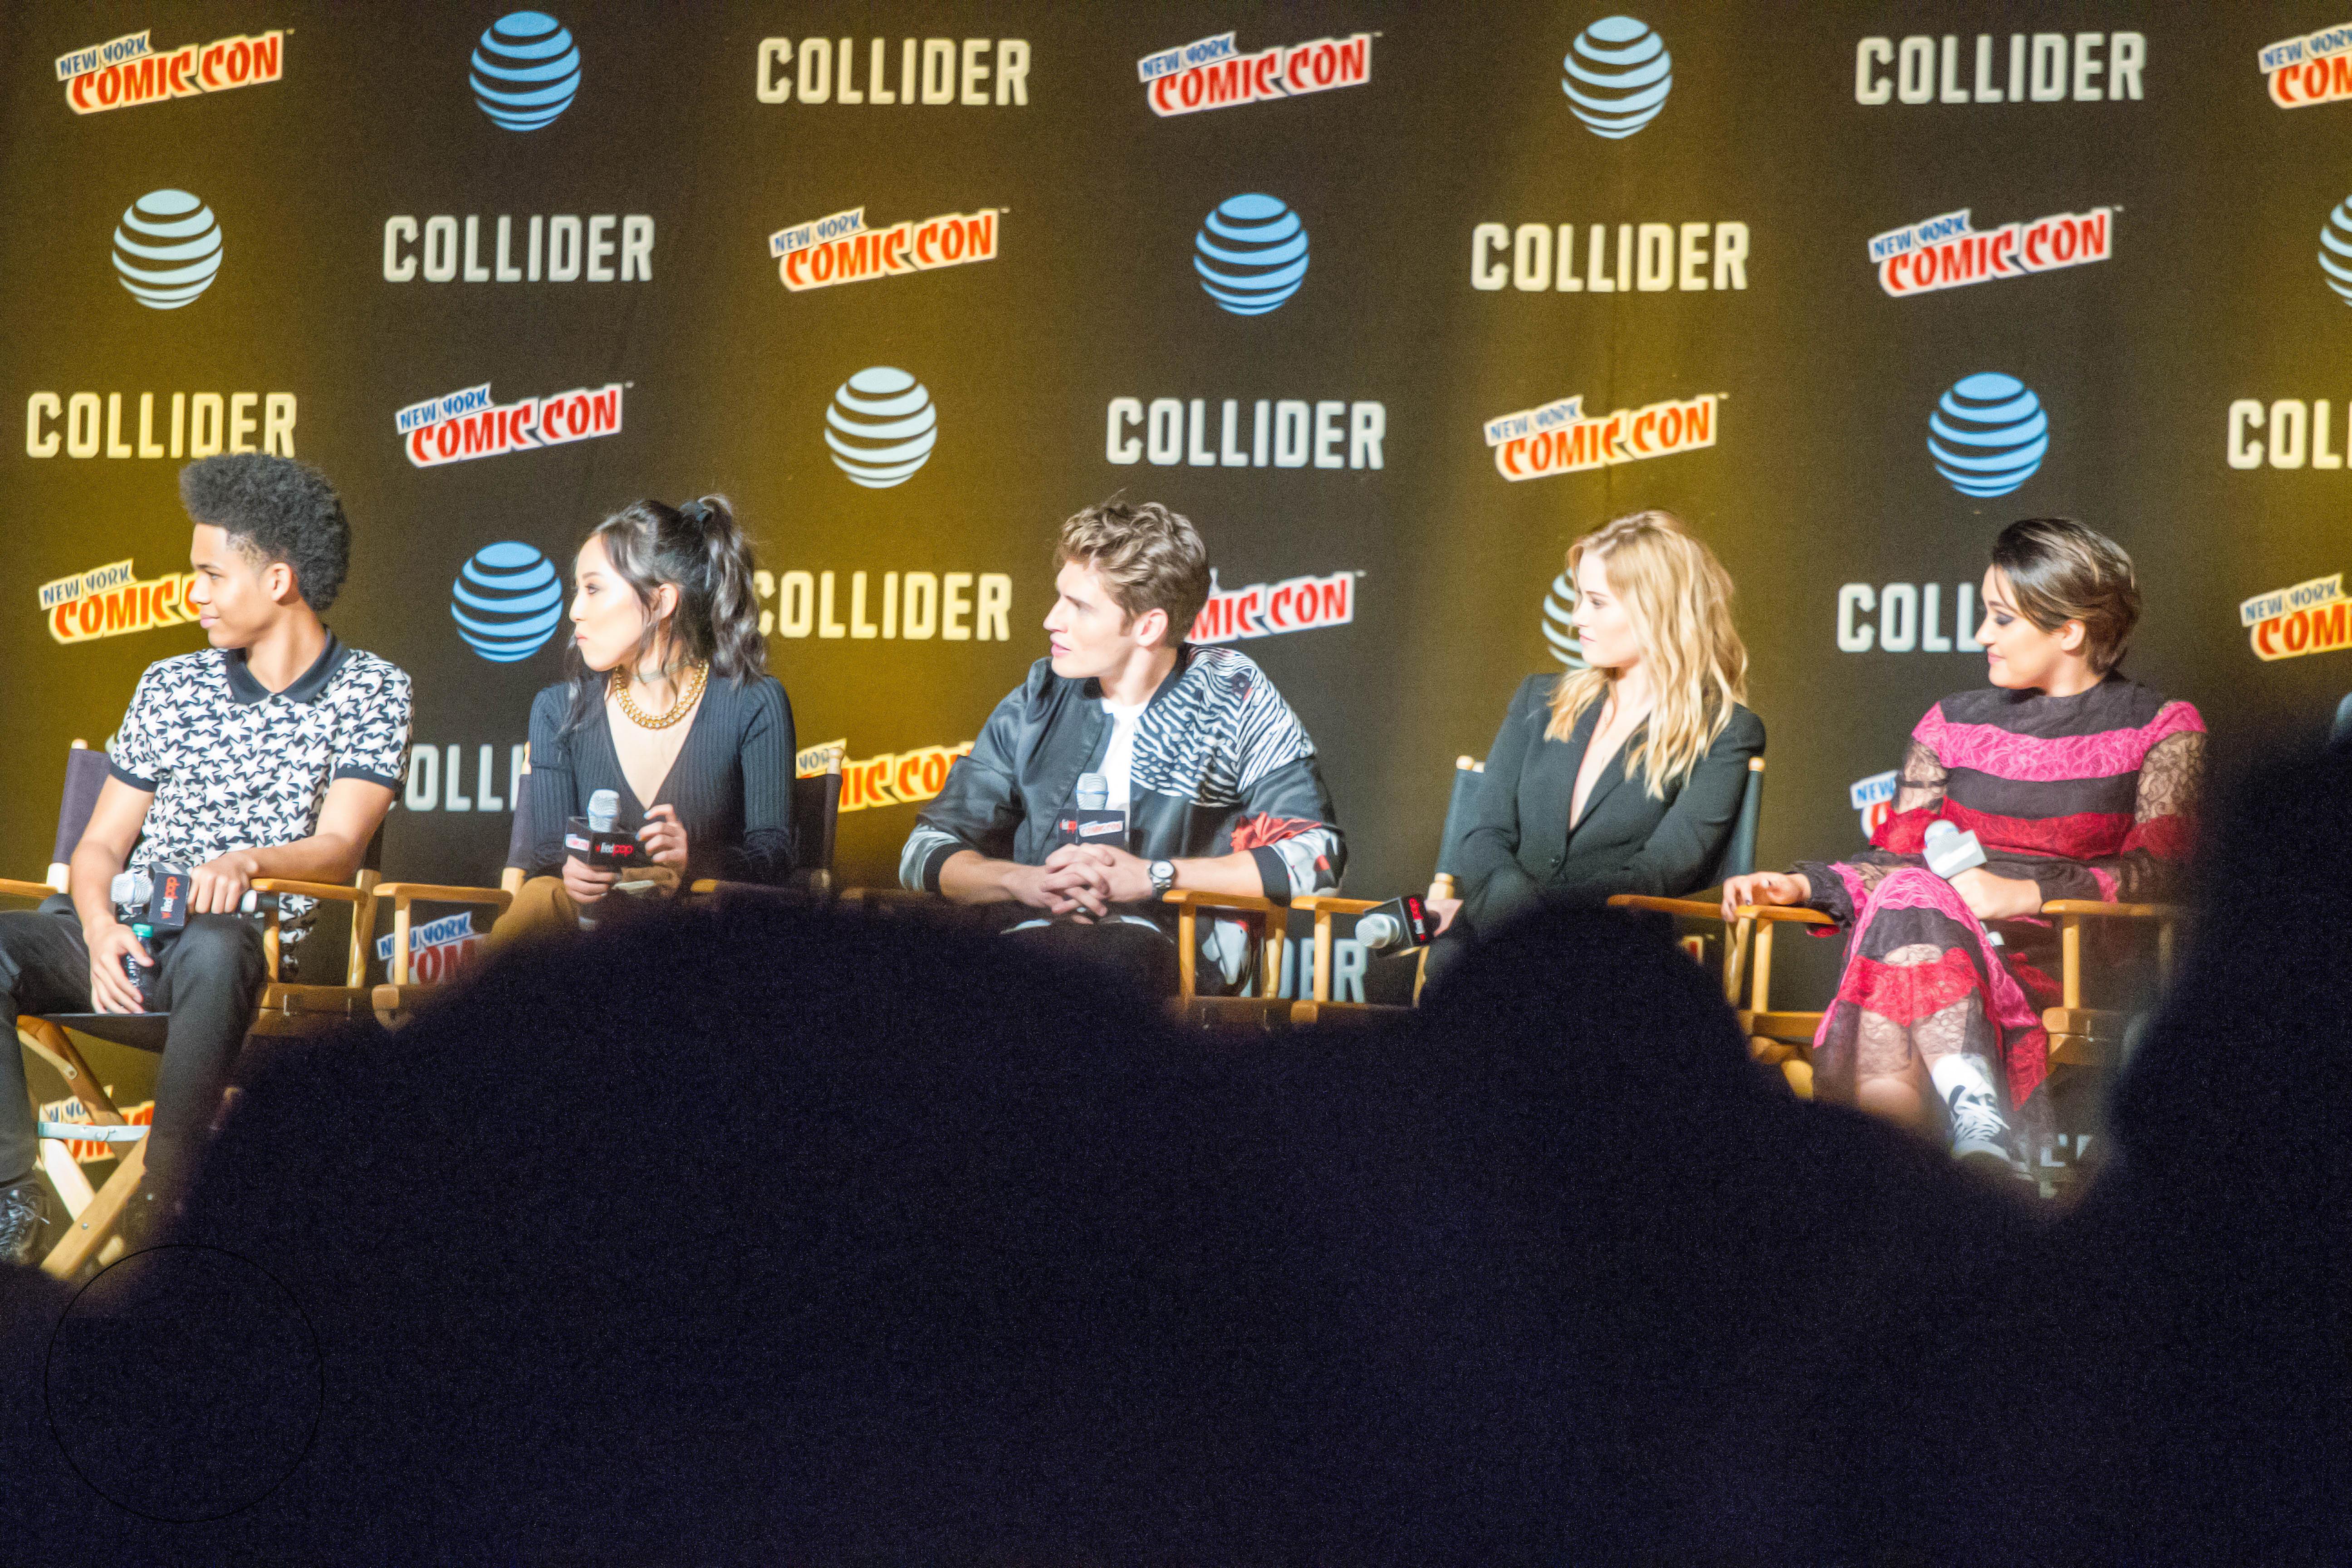 Cast of Runaways at the 2017 New York Comic Con (L-R: Rhenzy Feliz, Lyrica  Okano, Gregg Sulkin, Virginia Gardner and Ariela Barer)